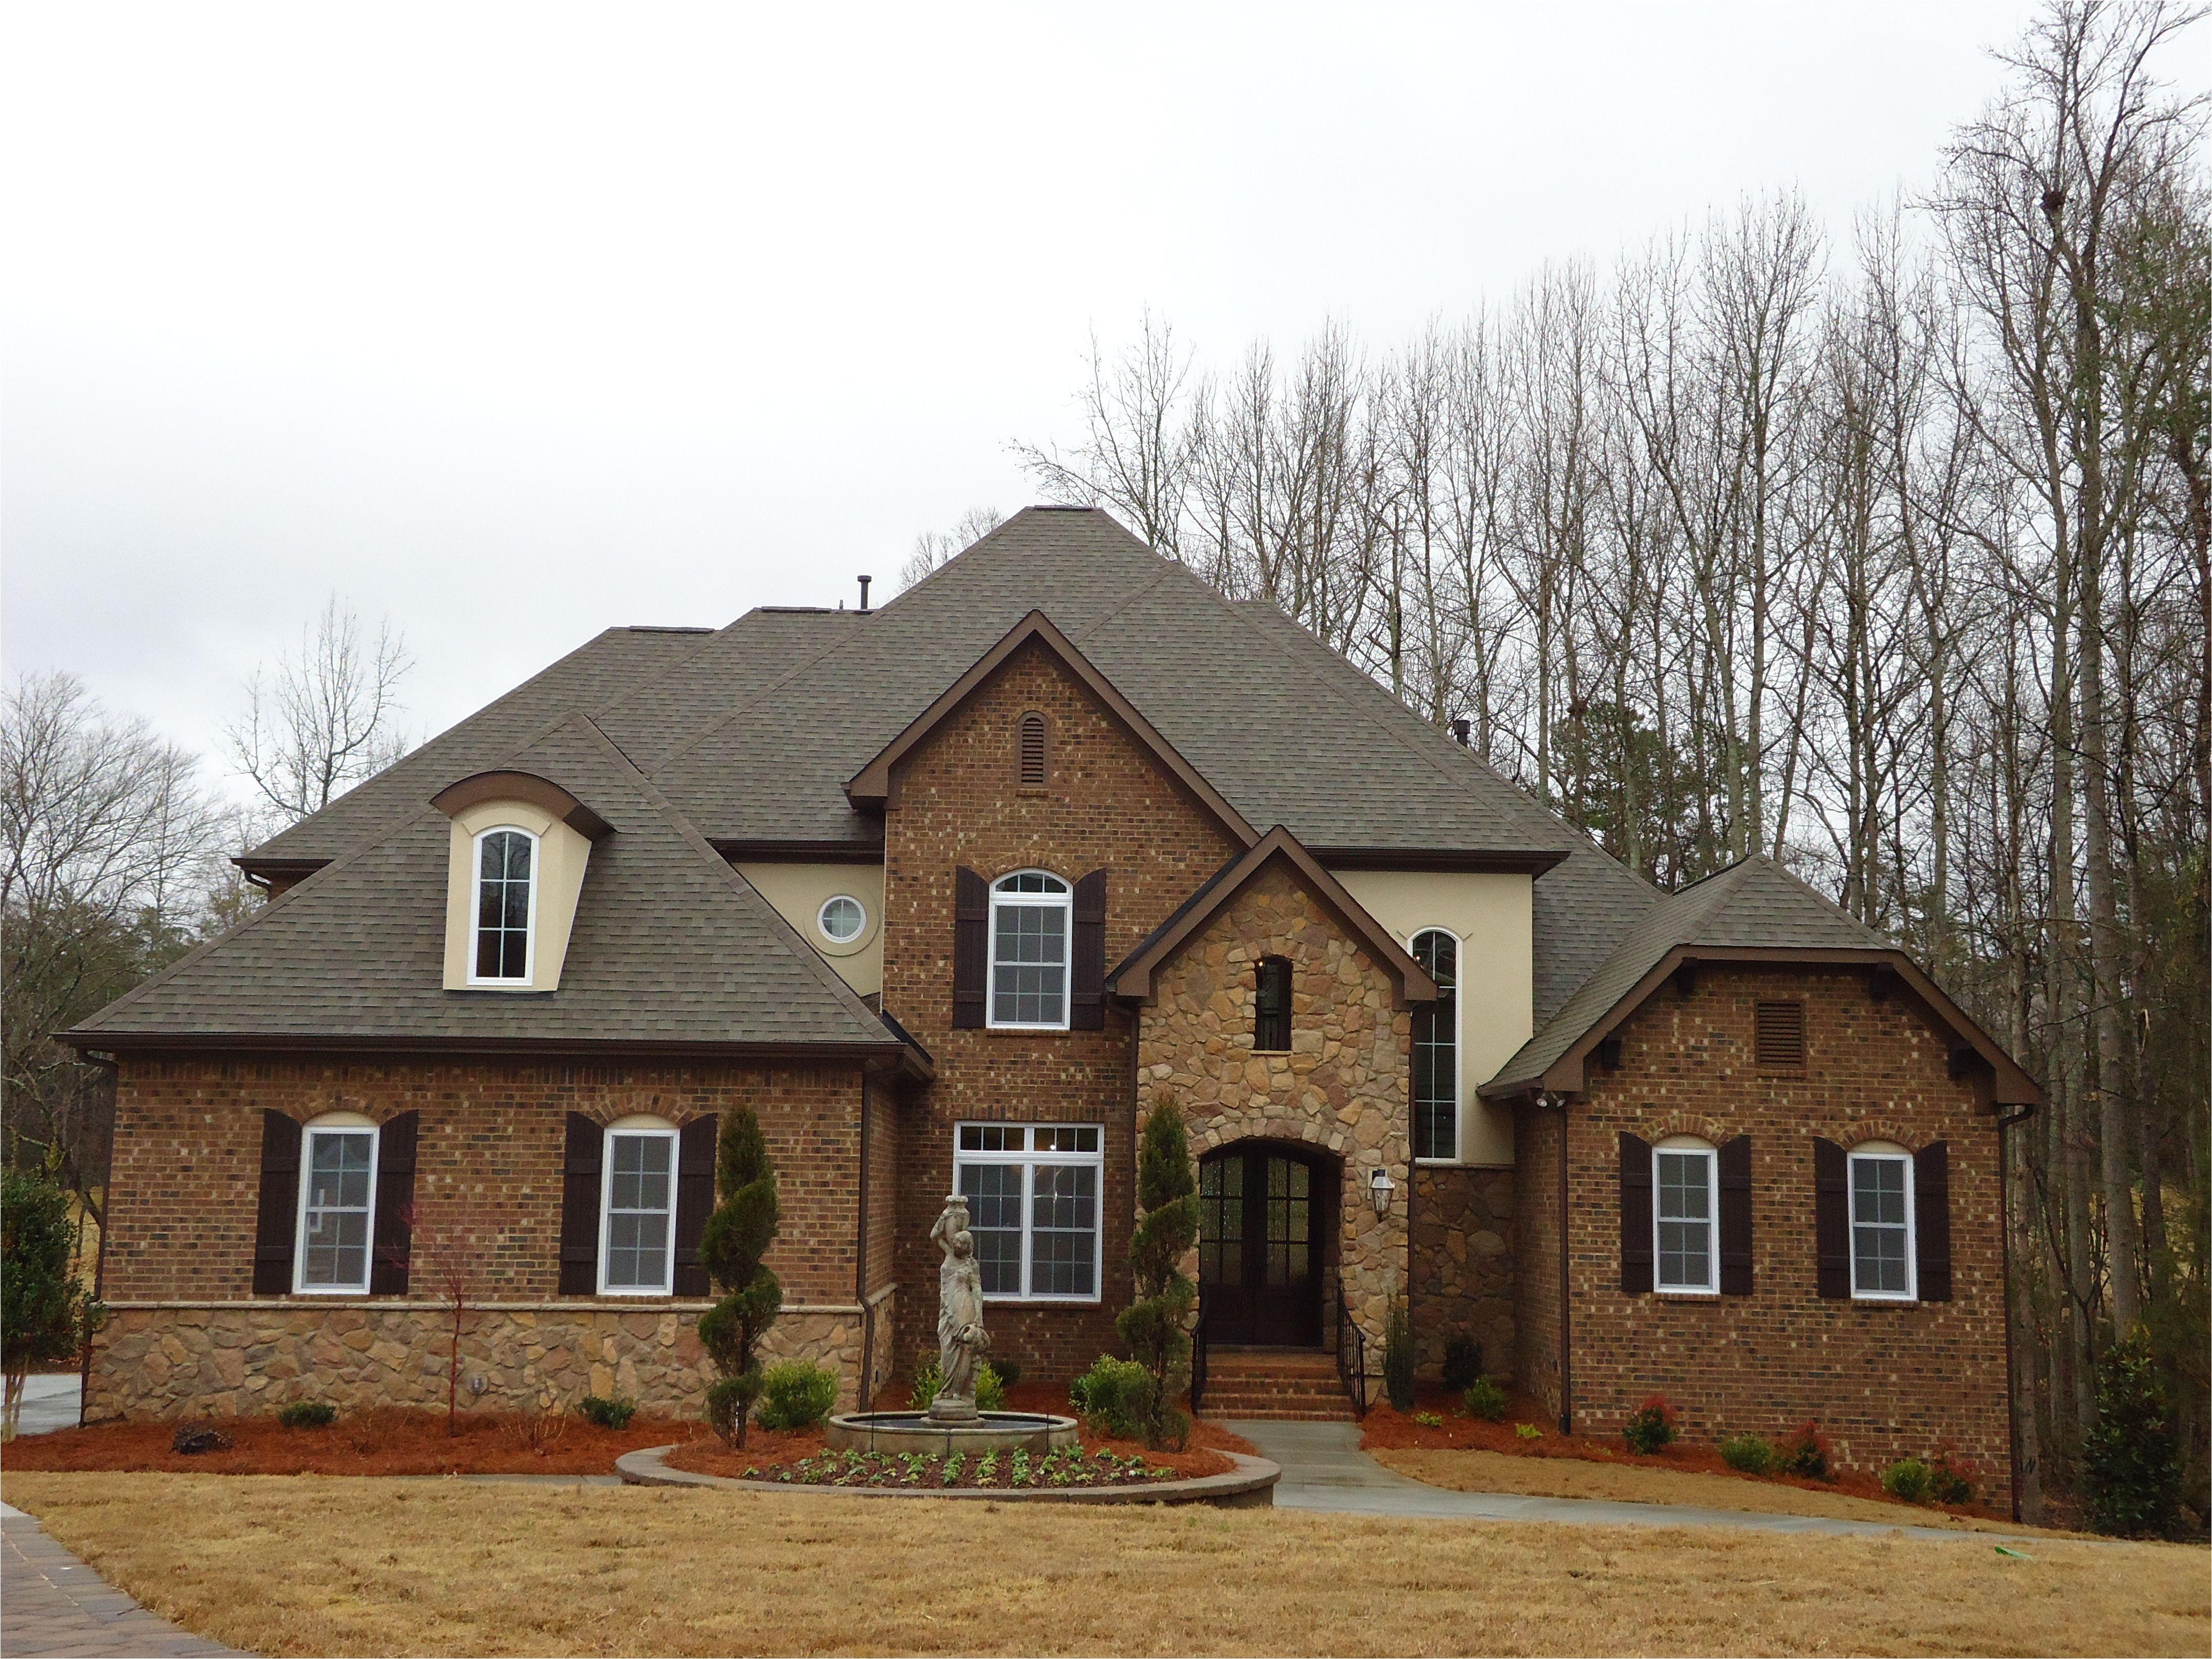 exterior 4 roof owens corning oakridge asphalt shingle driftwood soffits sw6083 sable fascia sw6083 sable stucco paint sw6142 macadamia